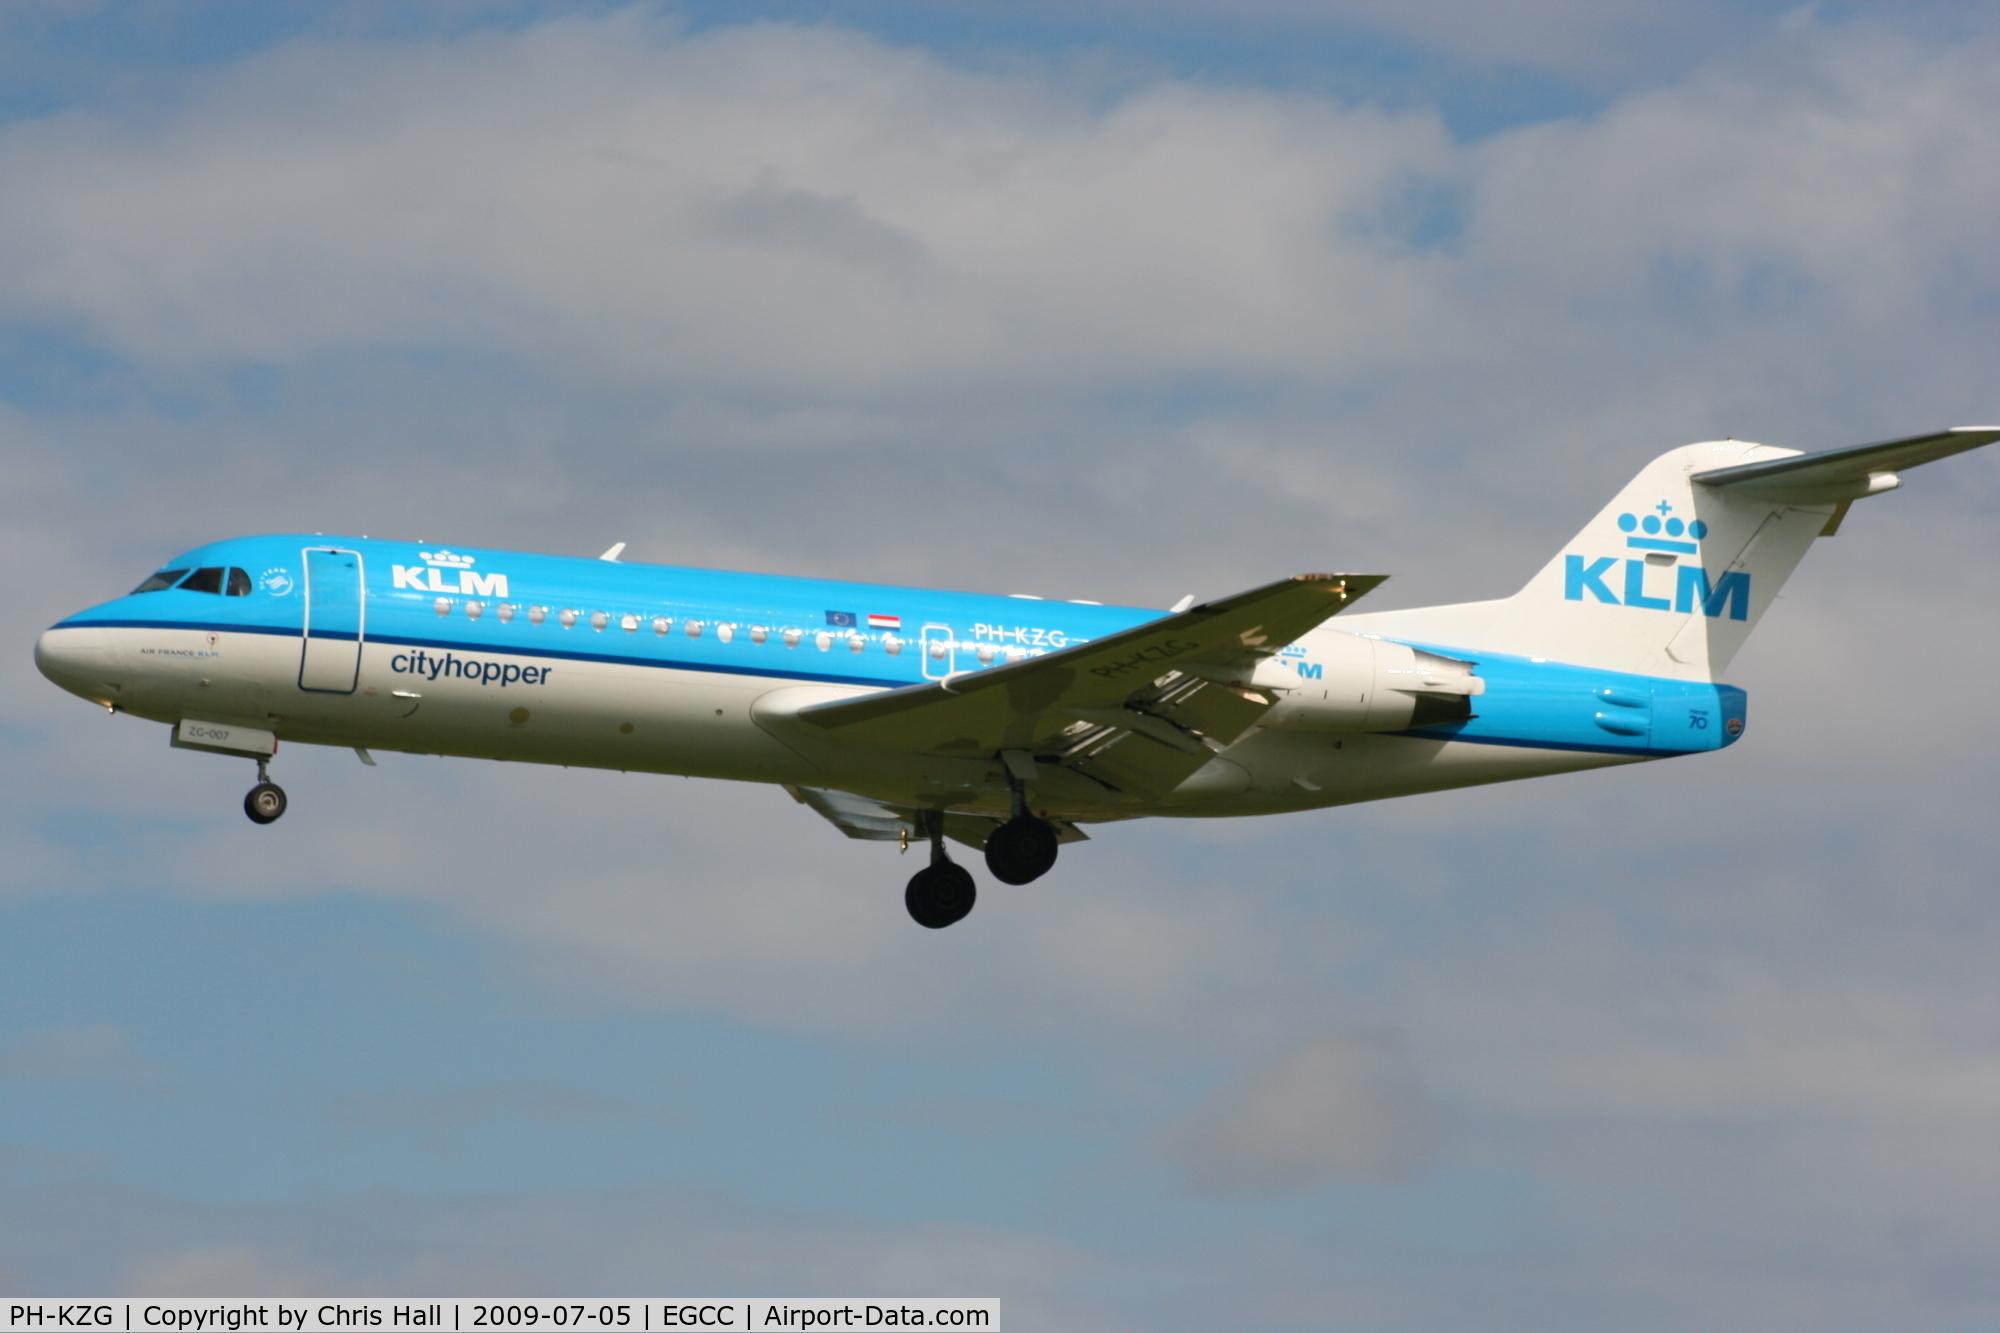 PH-KZG, 1996 Fokker 70 (F-28-0070) C/N 11578, KLM Cityhopper